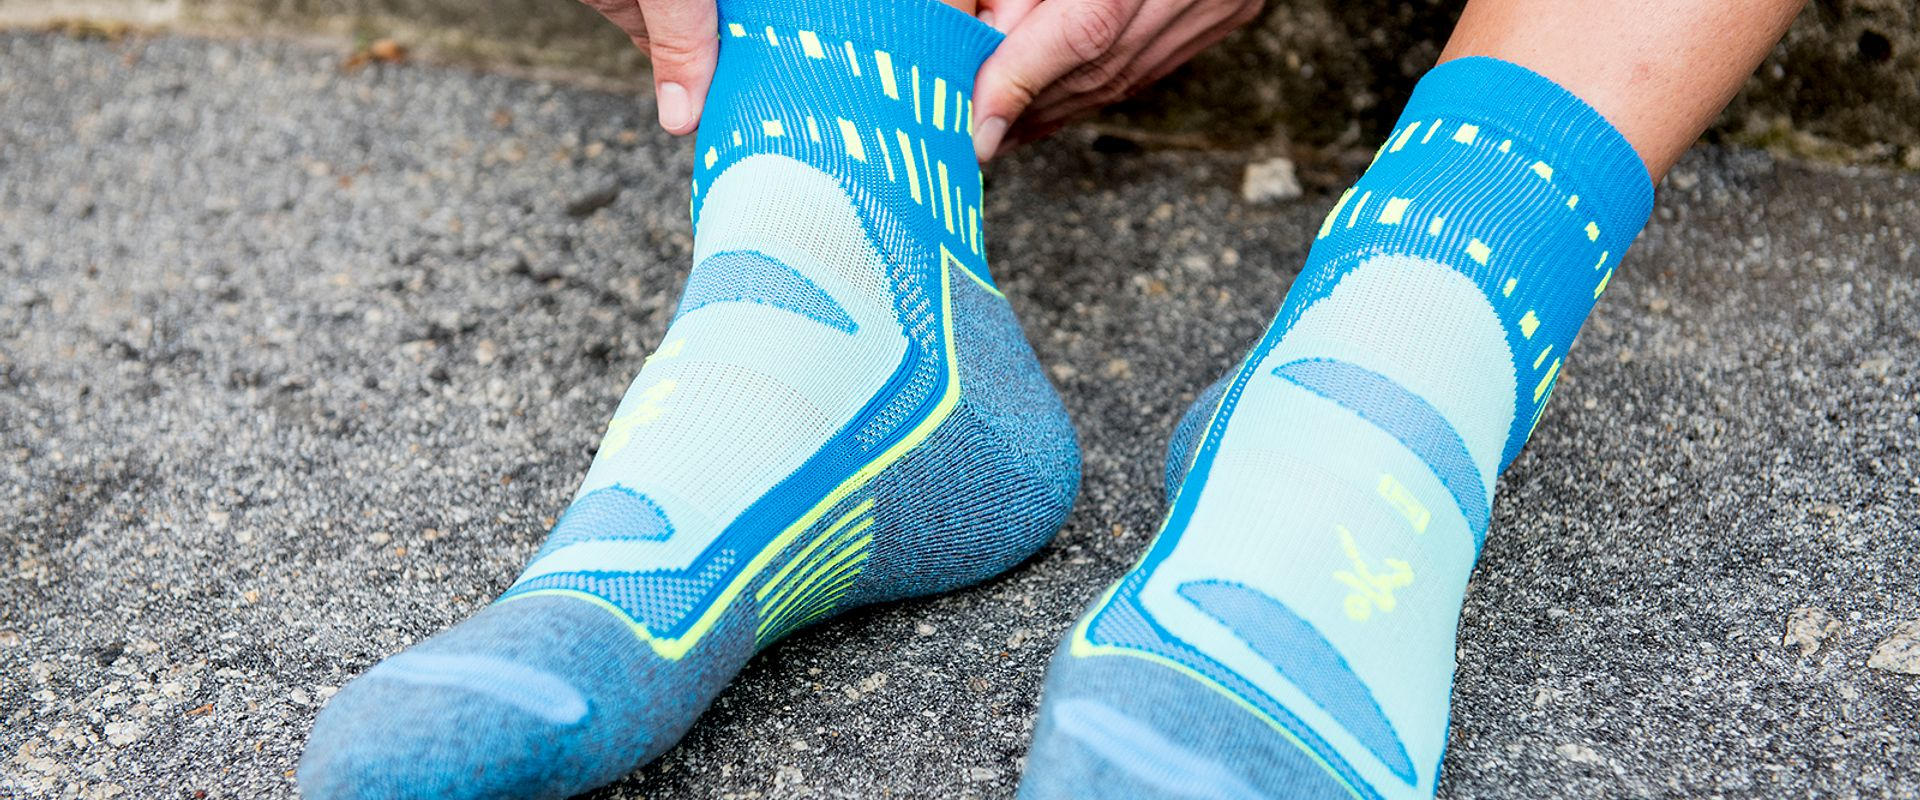 The Best Running Socks | Fleet Feet